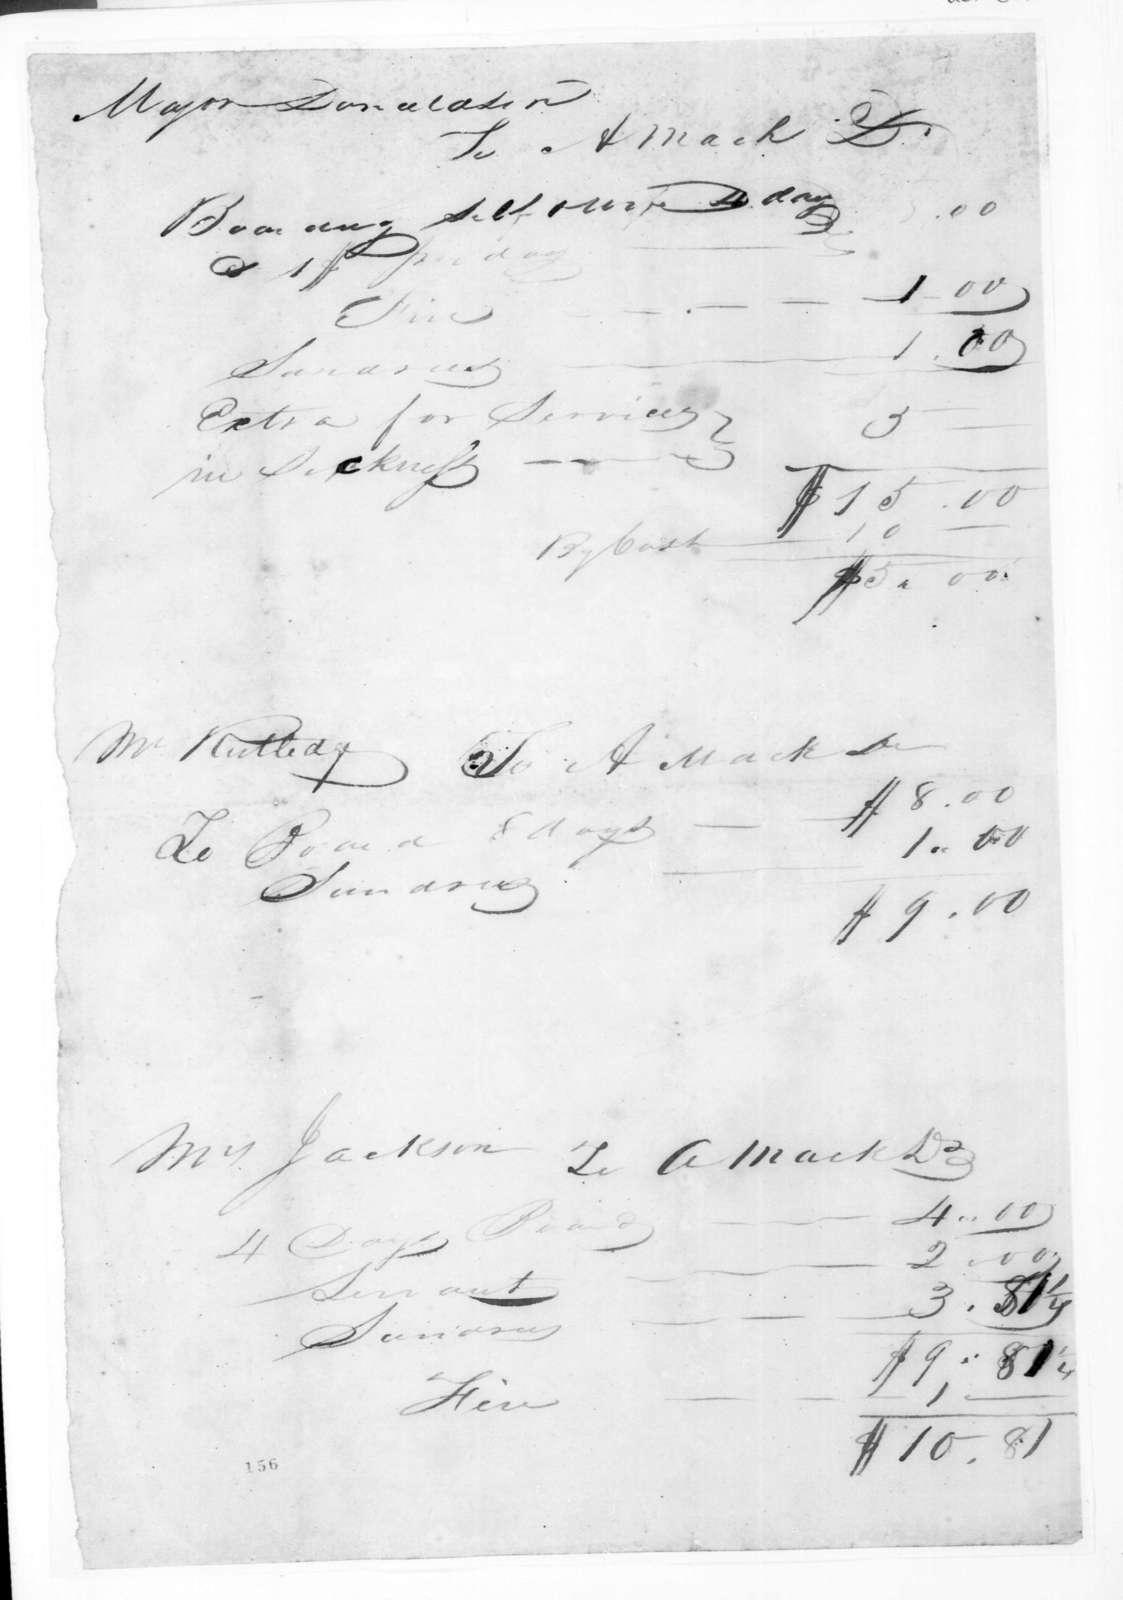 A. Mack to Andrew Jackson Donelson et al., April 8, 1825